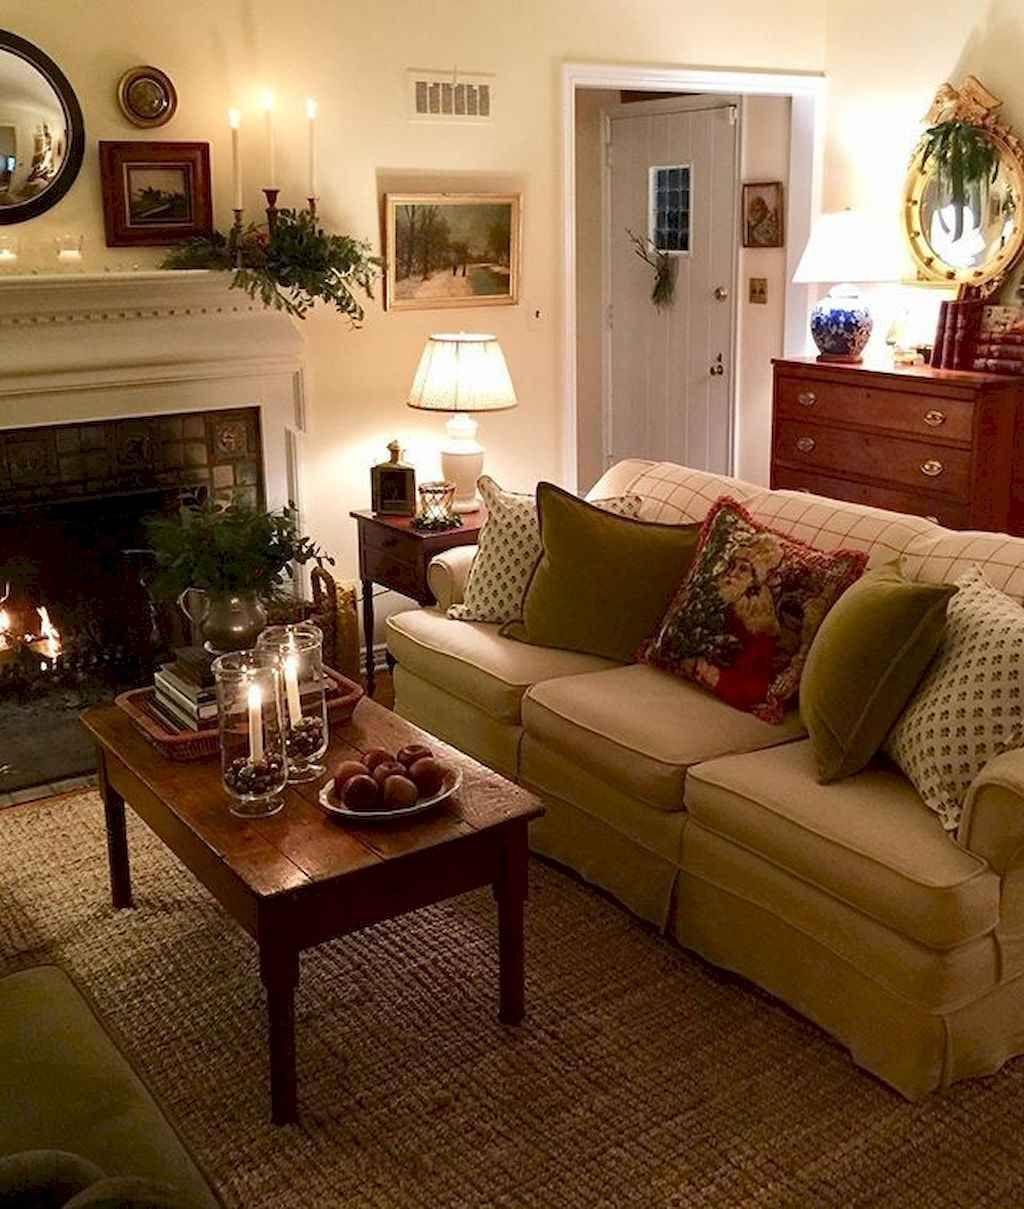 01 Cozy Apartment Living Room Decorating Ideas | Cozy ...